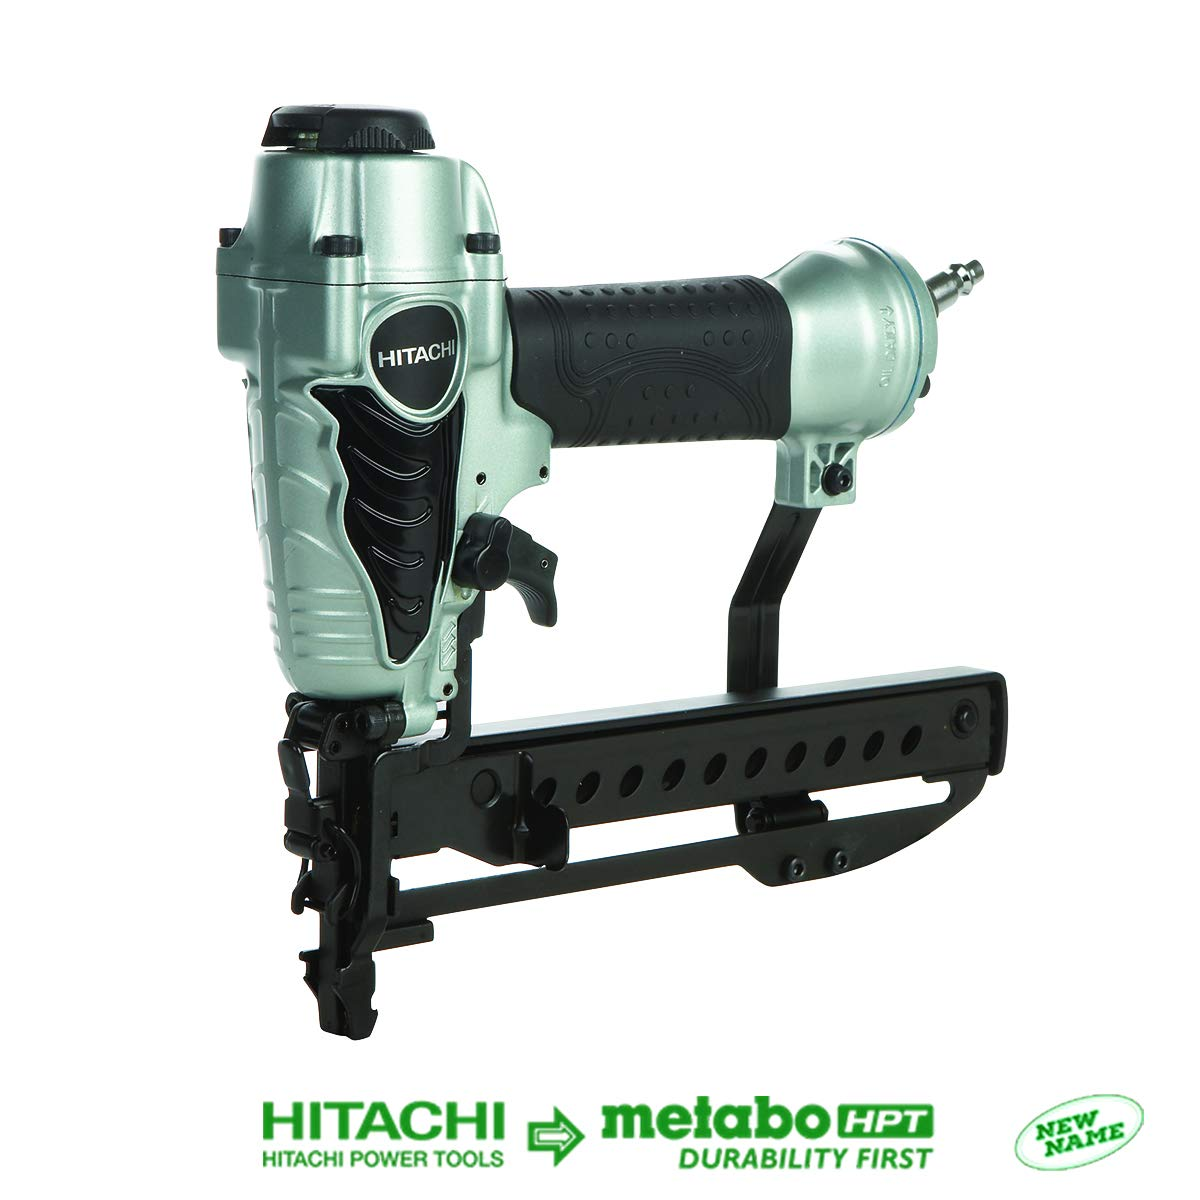 Hitachi N3804AB3 1/4'' Narrow Crown Stapler, 18 Gauge, ½-Inch to 1-1/2-Inch Staple Length by Hitachi